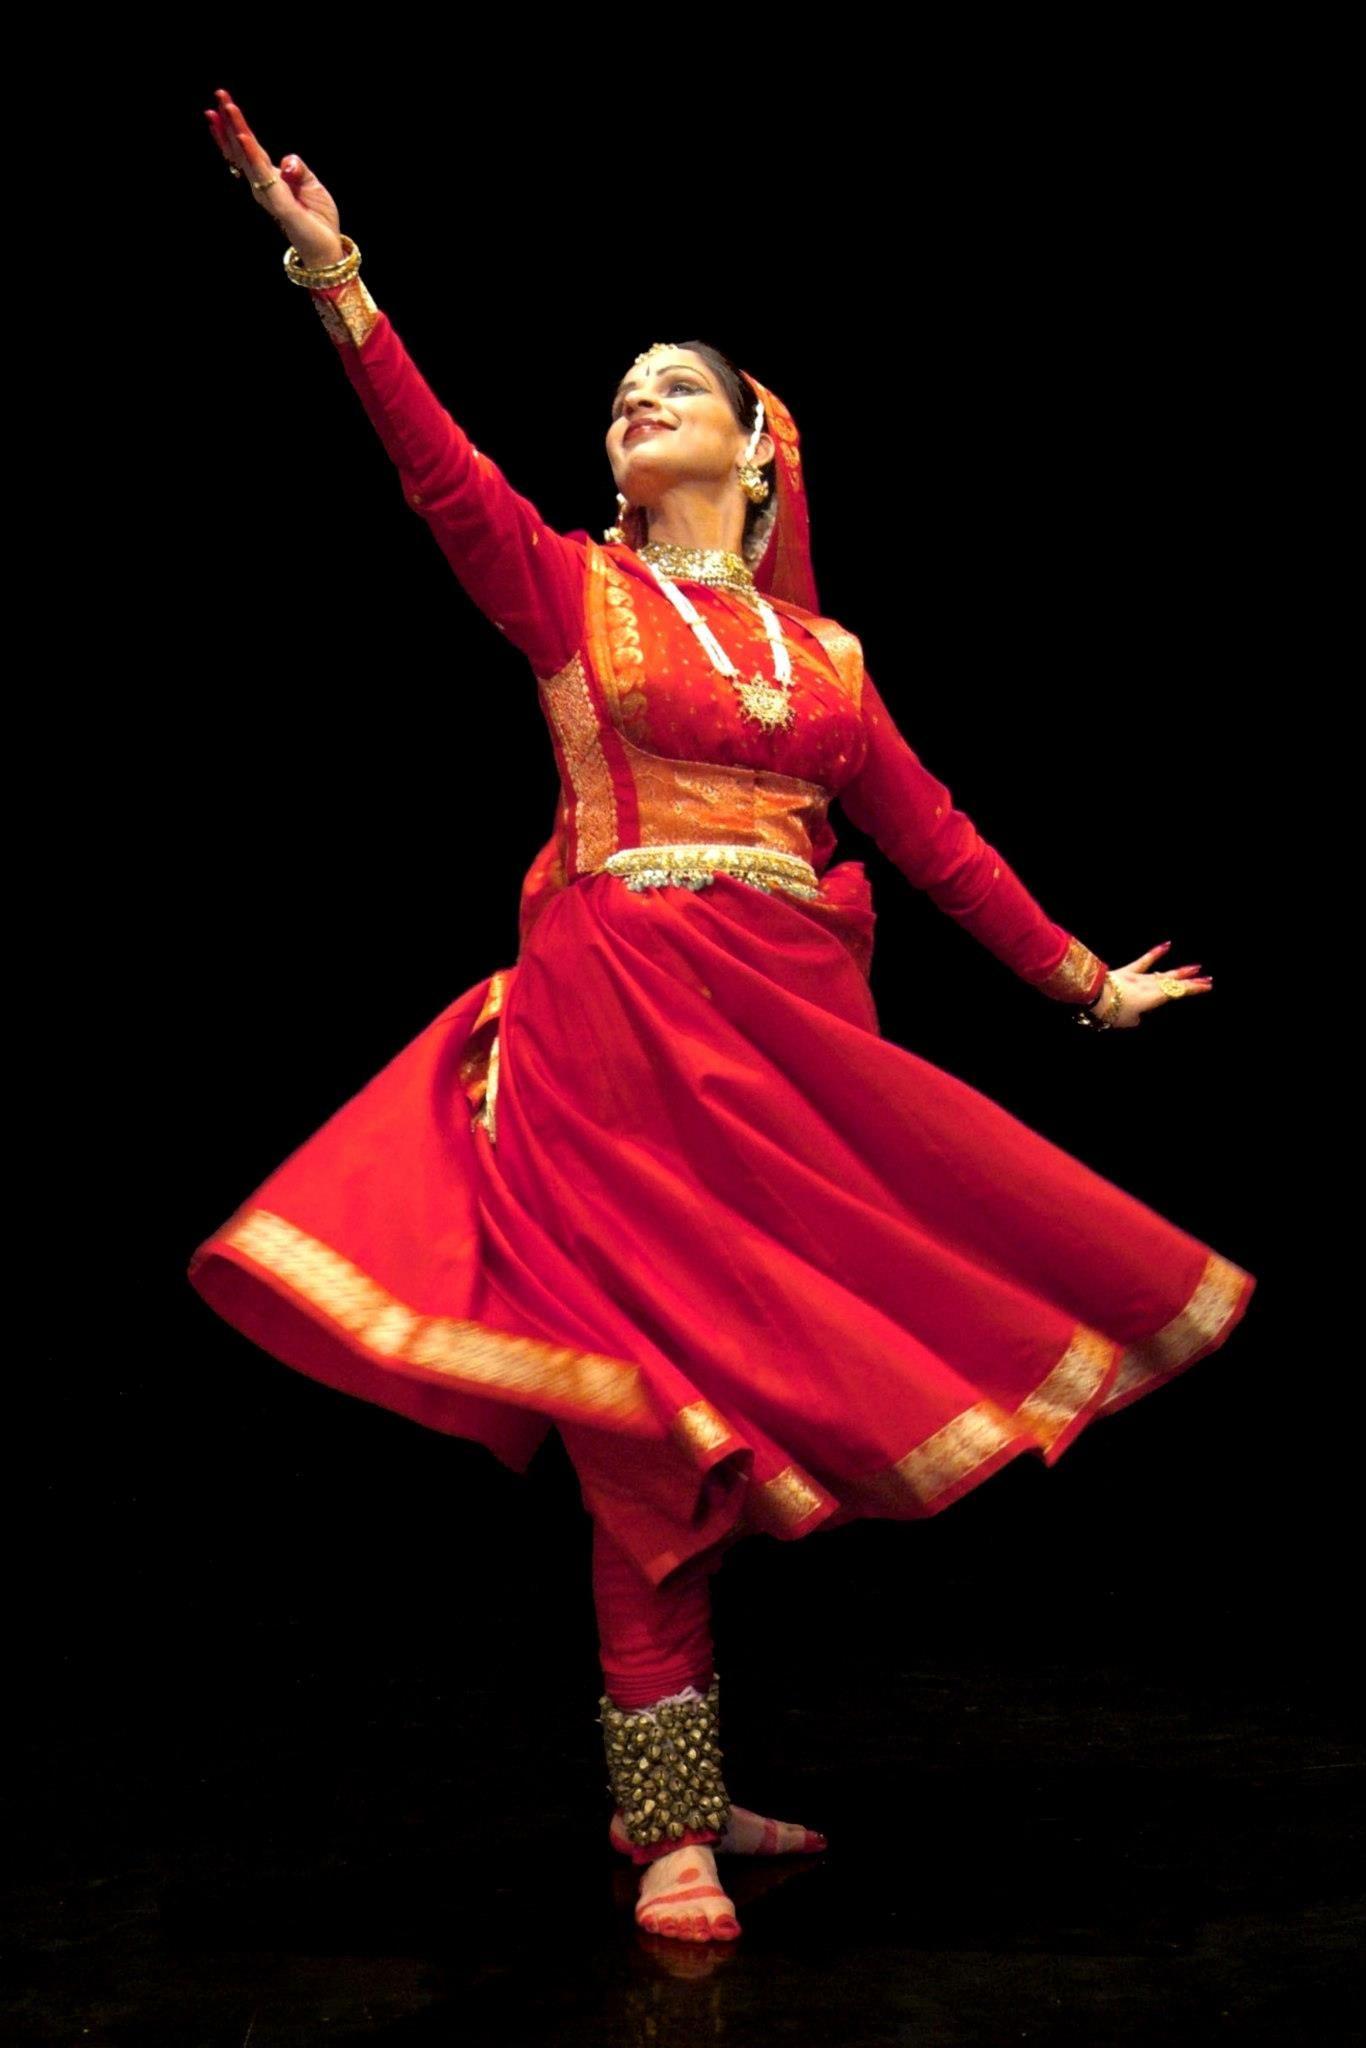 Sharmila Sharma - love her style in Kathak dances! | India ...